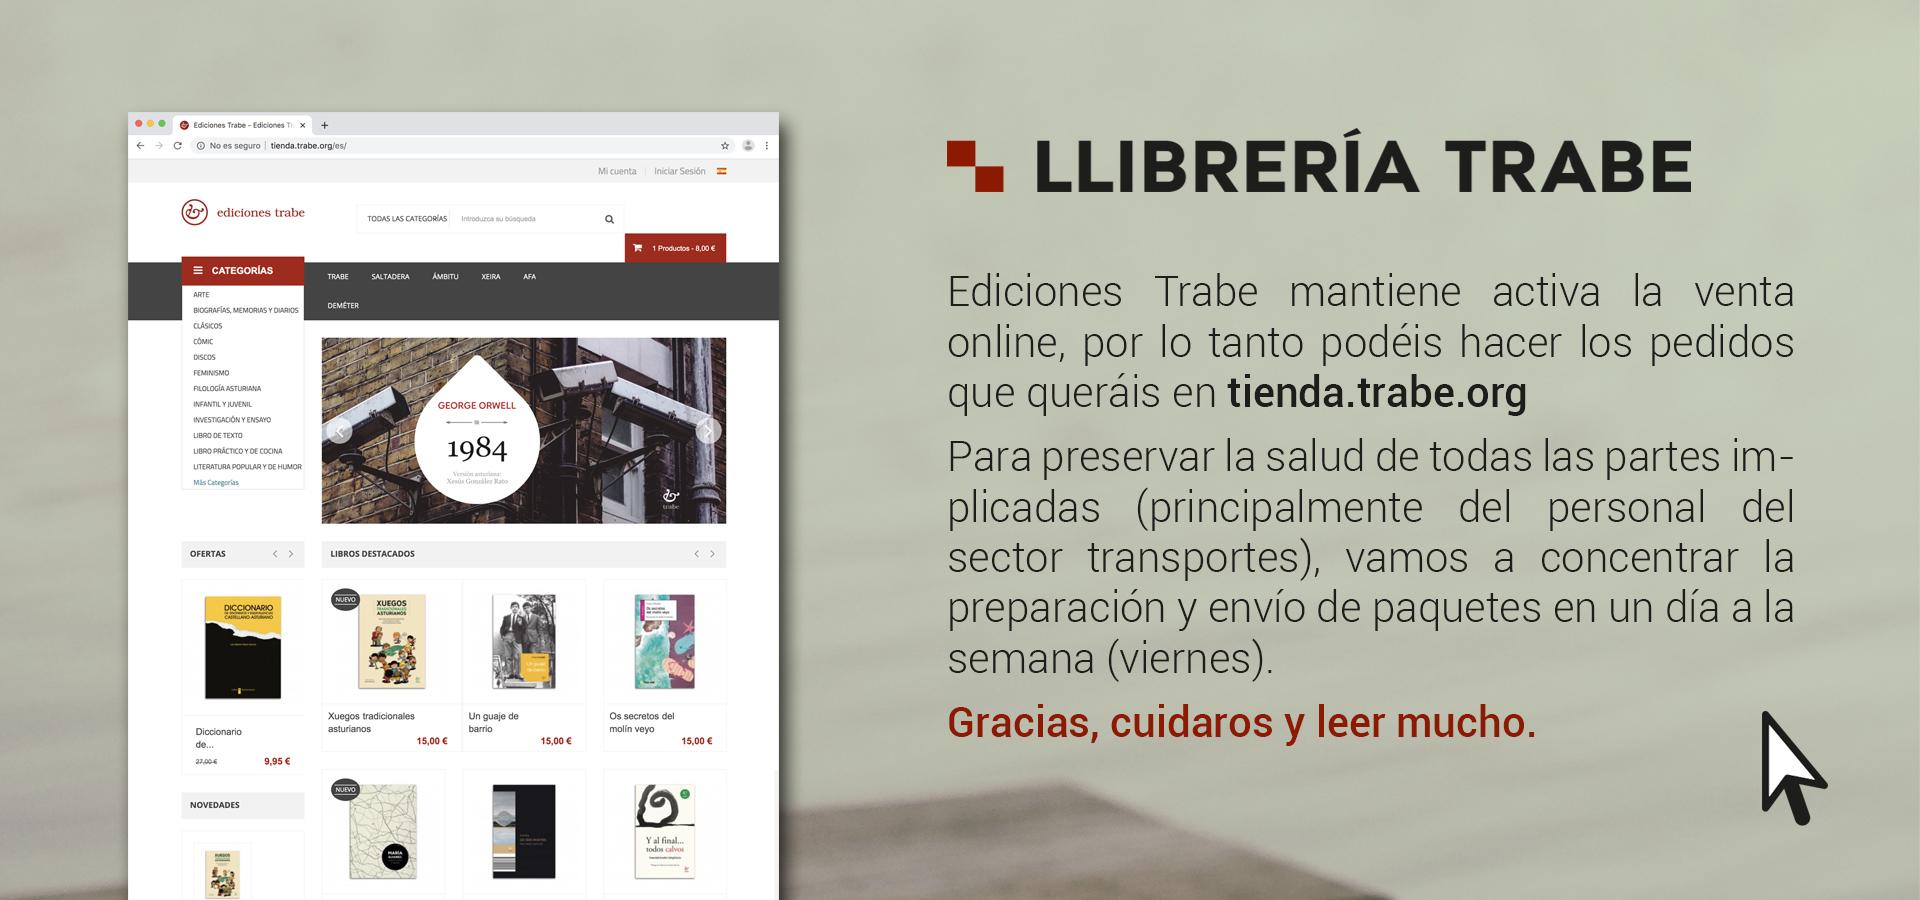 Llibreria-online-abierta-cast